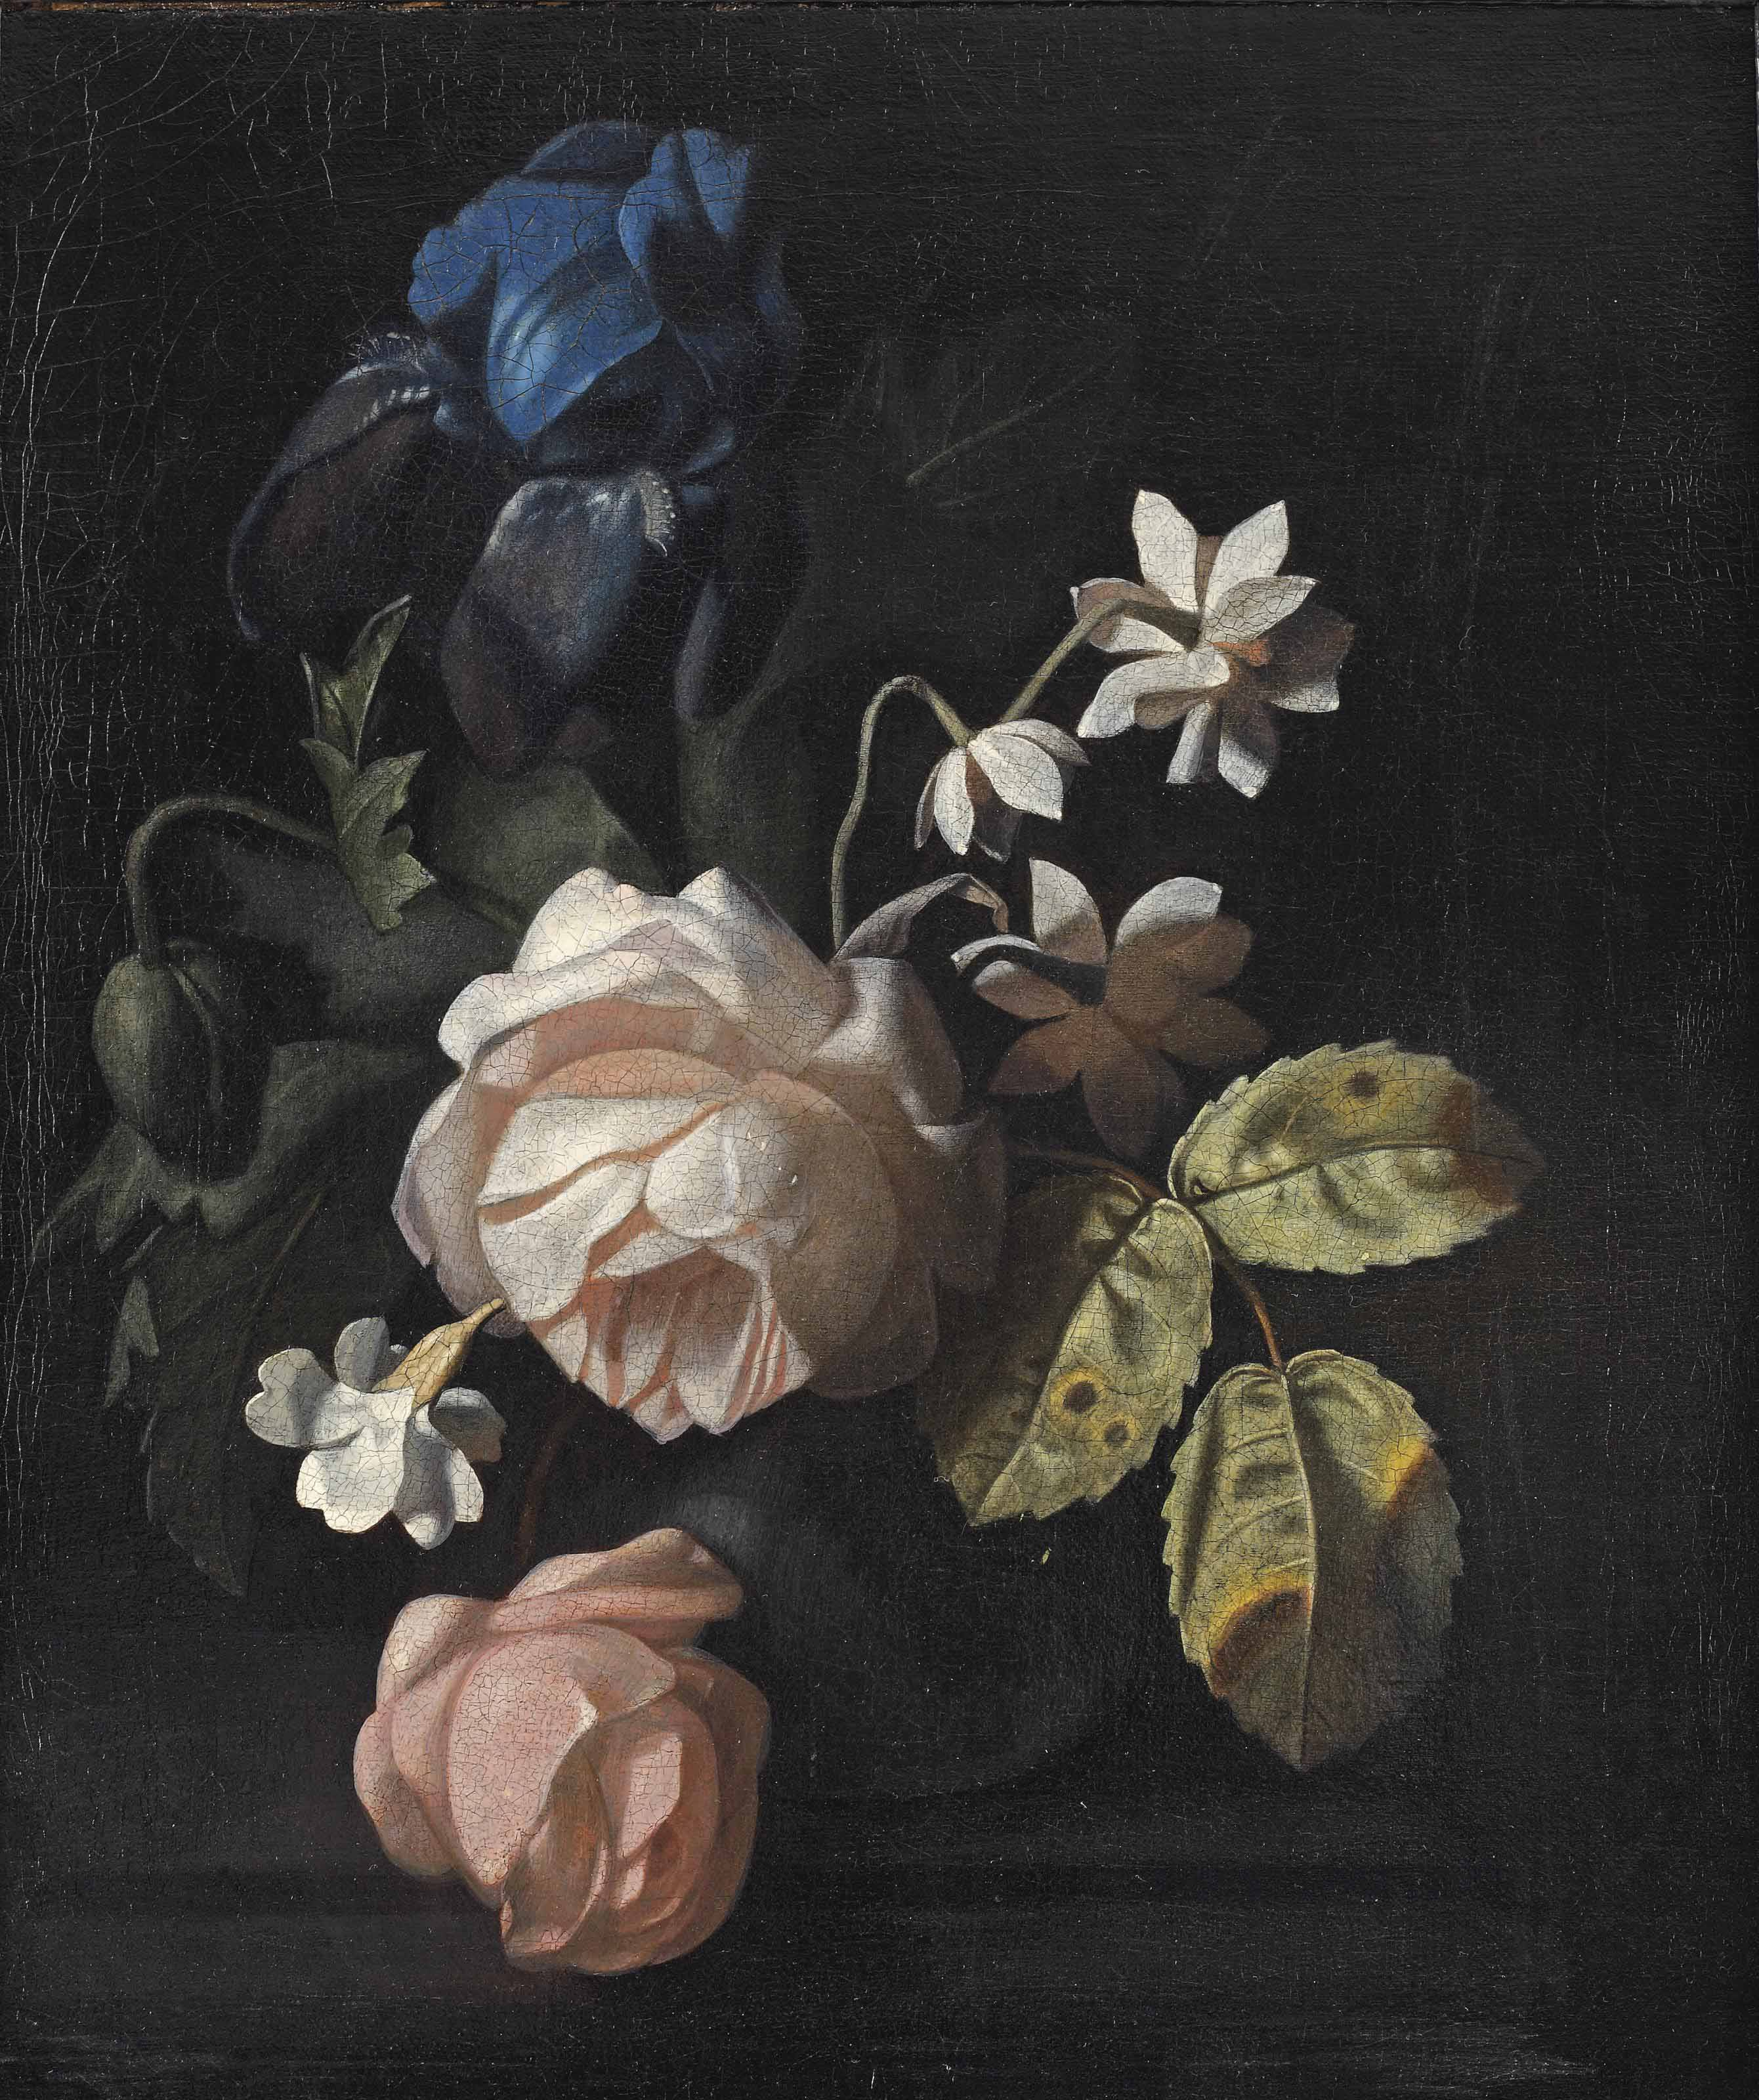 Simon Verelst (The Hague 1644-